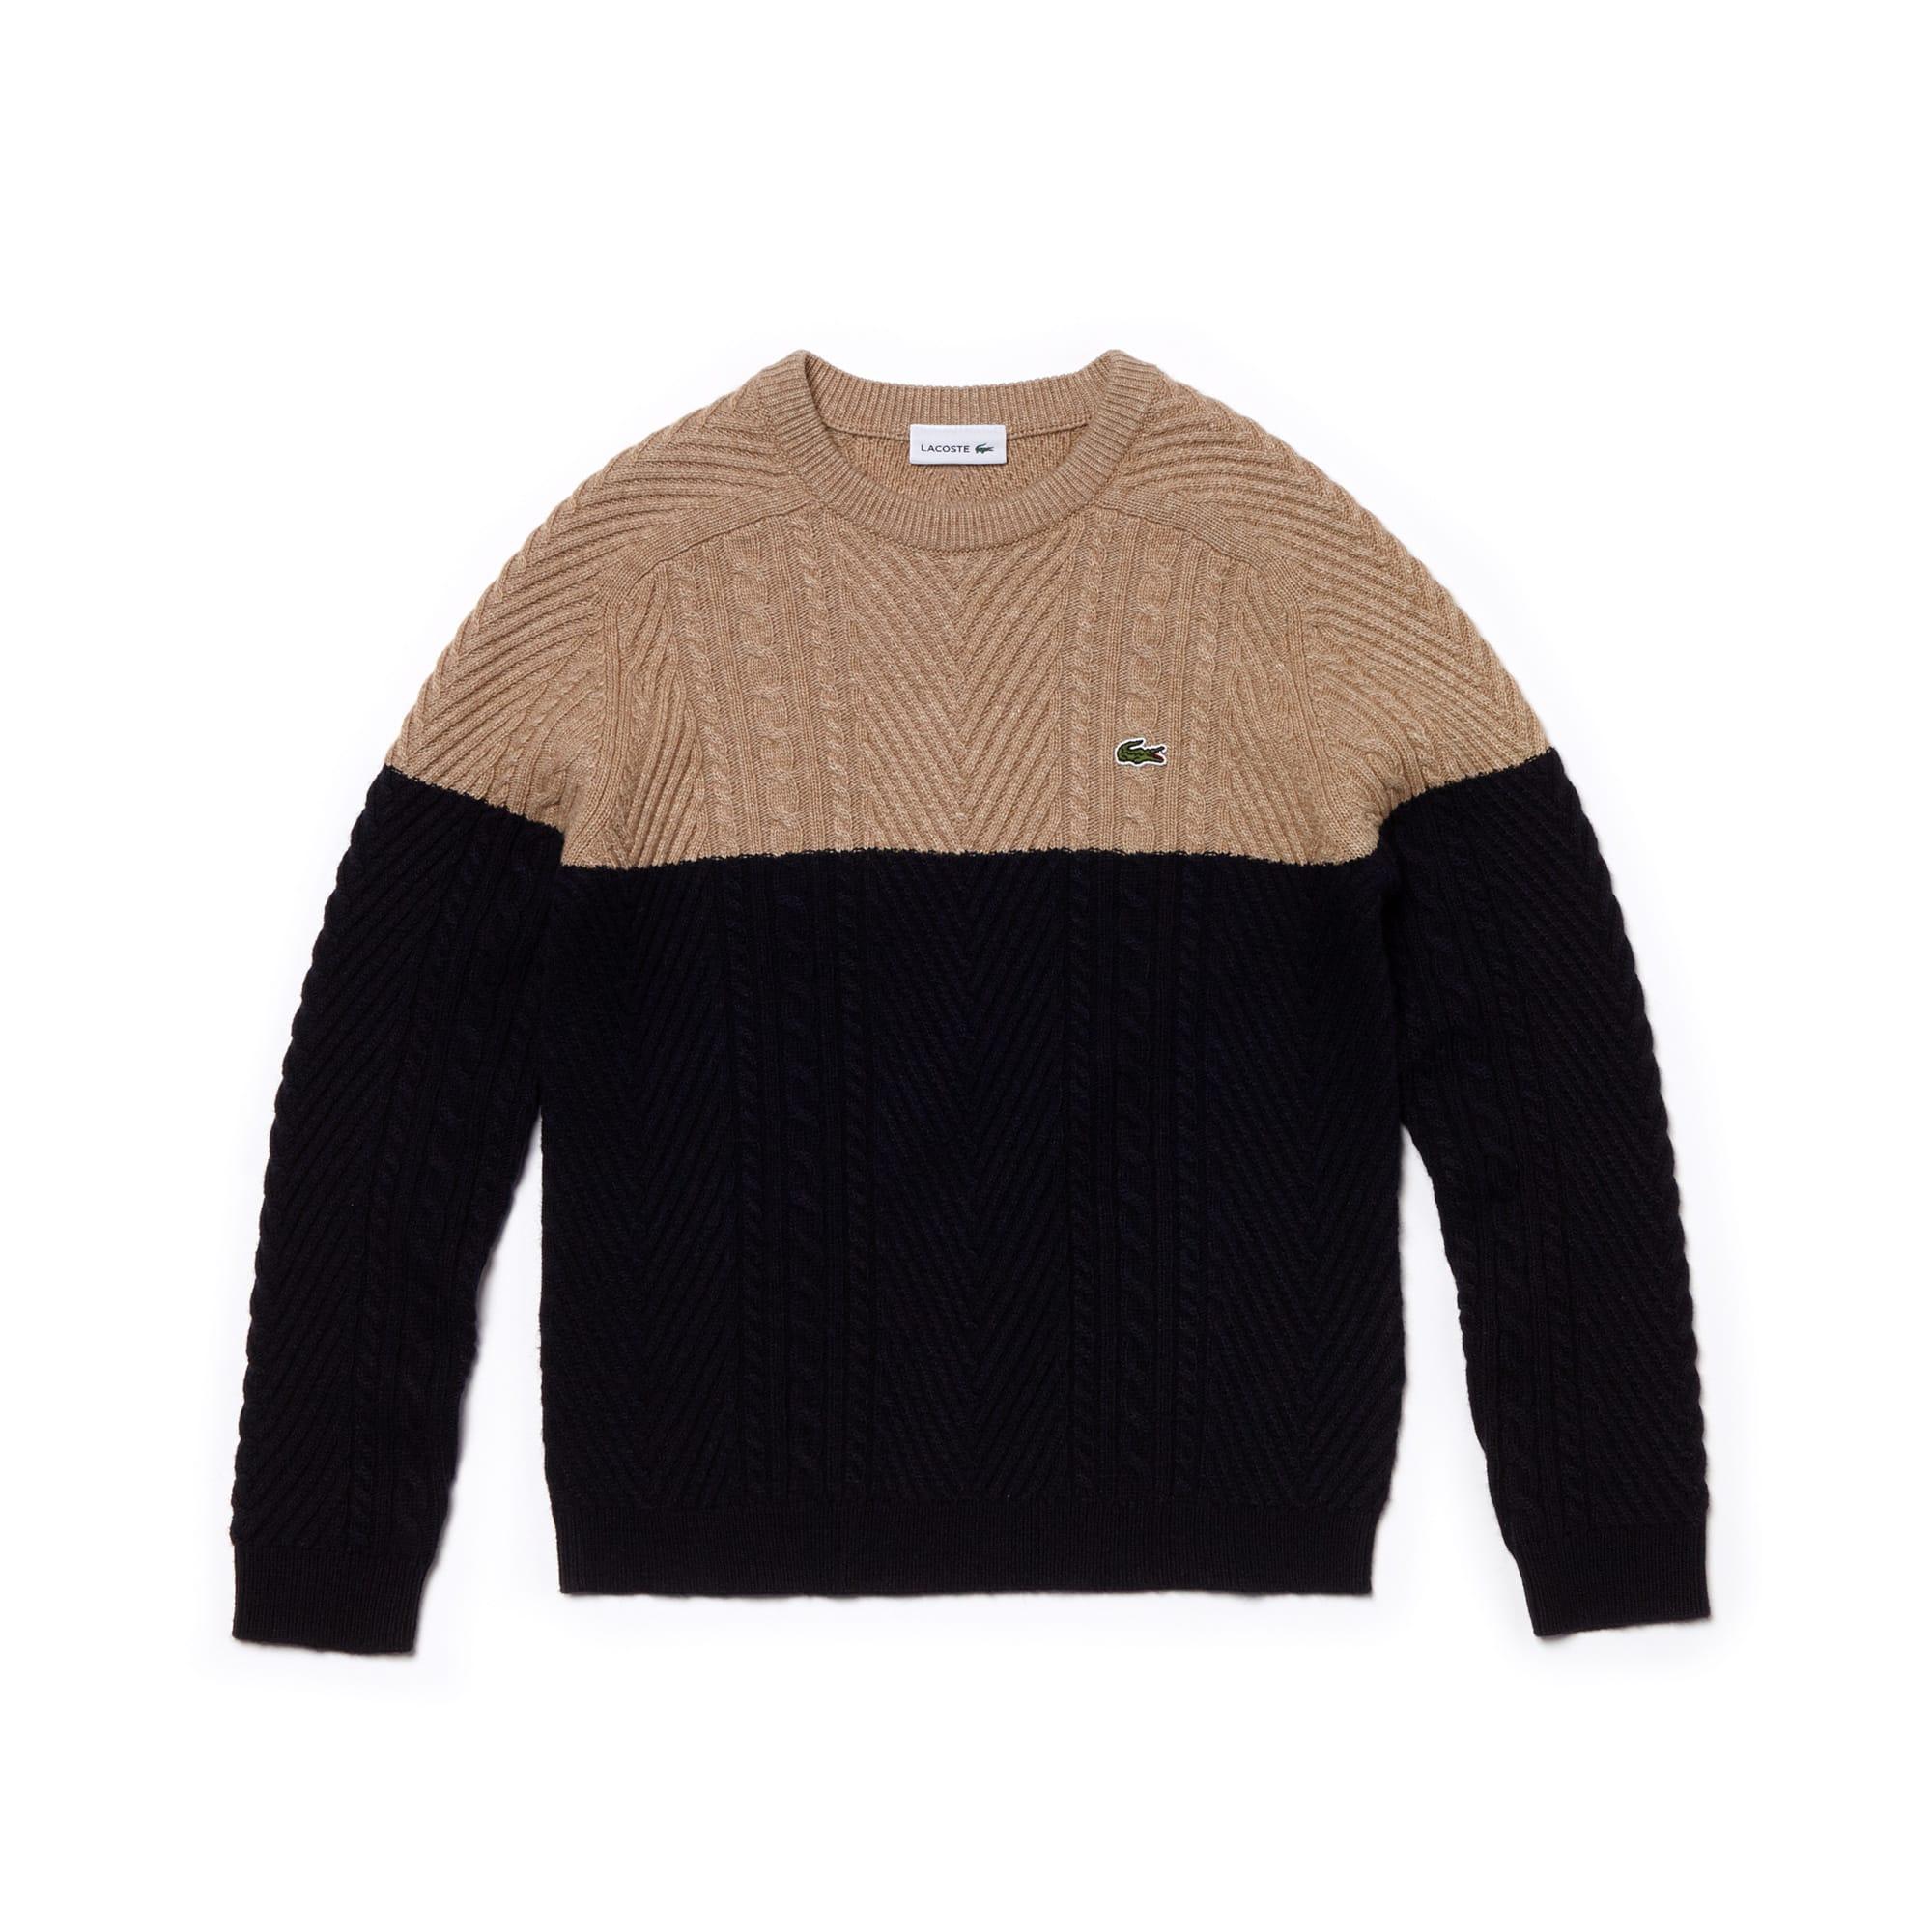 bd3bba01ae Boys' Crew Neck Cable Knit Colourblock Cotton Blend Sweater